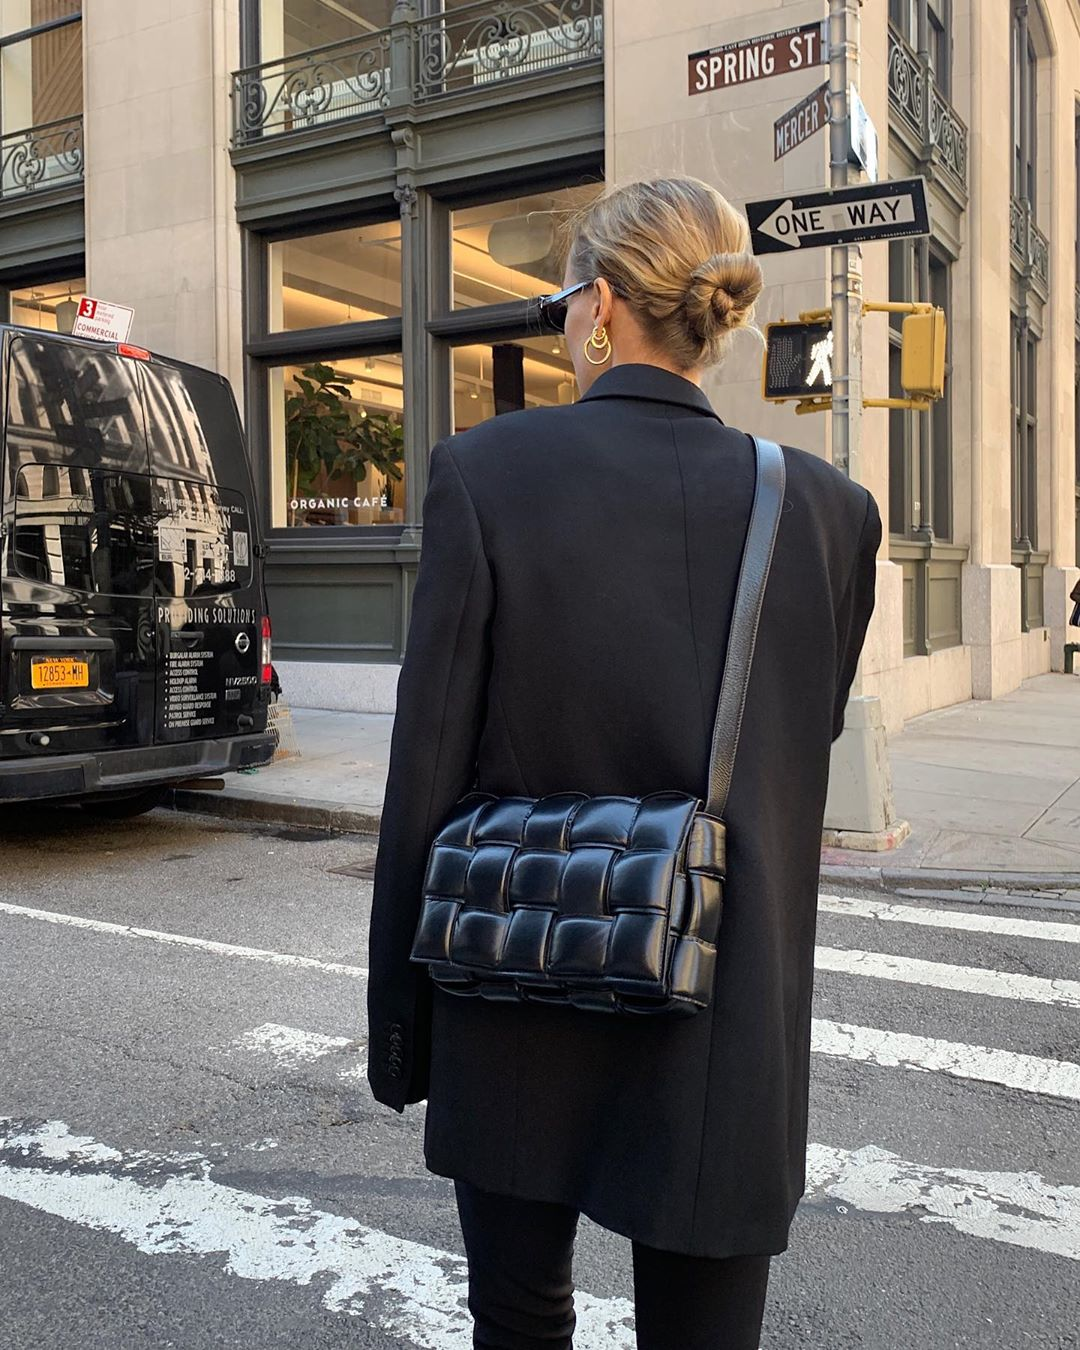 We Found a Great Bottega Veneta-Inspired Bag for Under $200 — @mvb Instagram Style